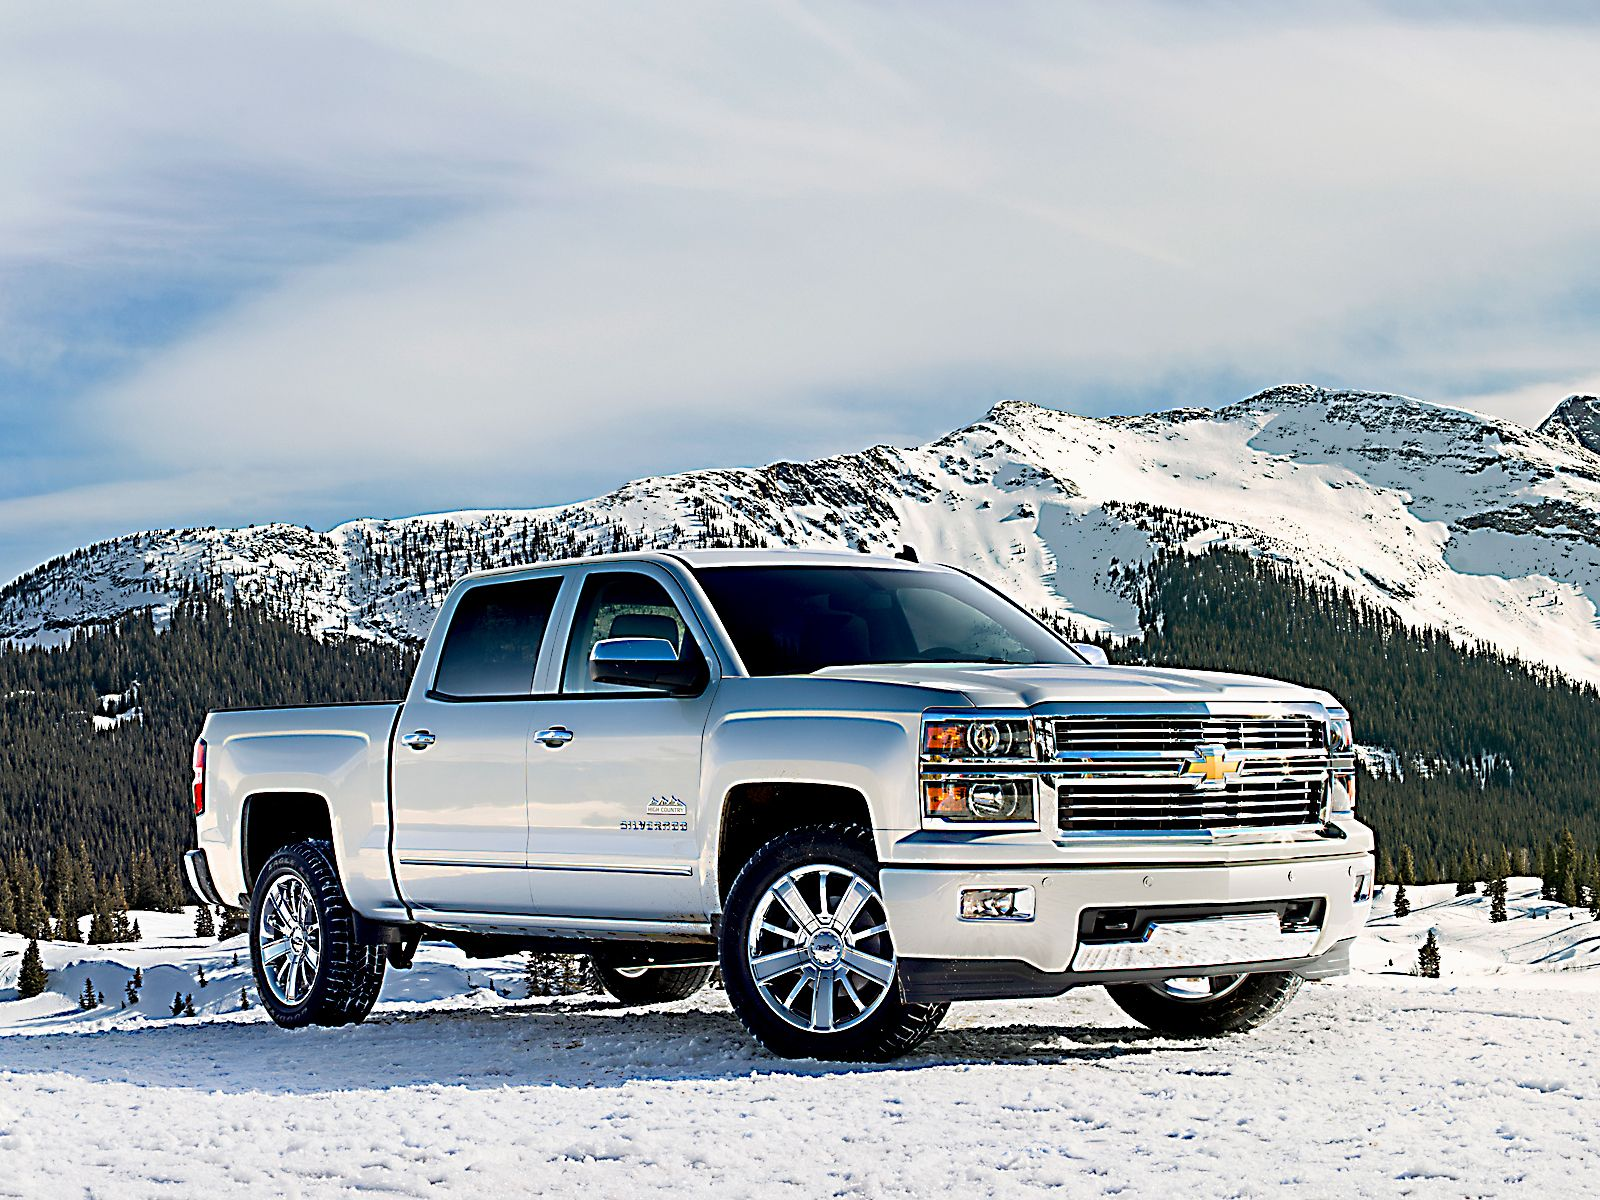 Chevy Silverado The Classier 2014 Silverado High Country